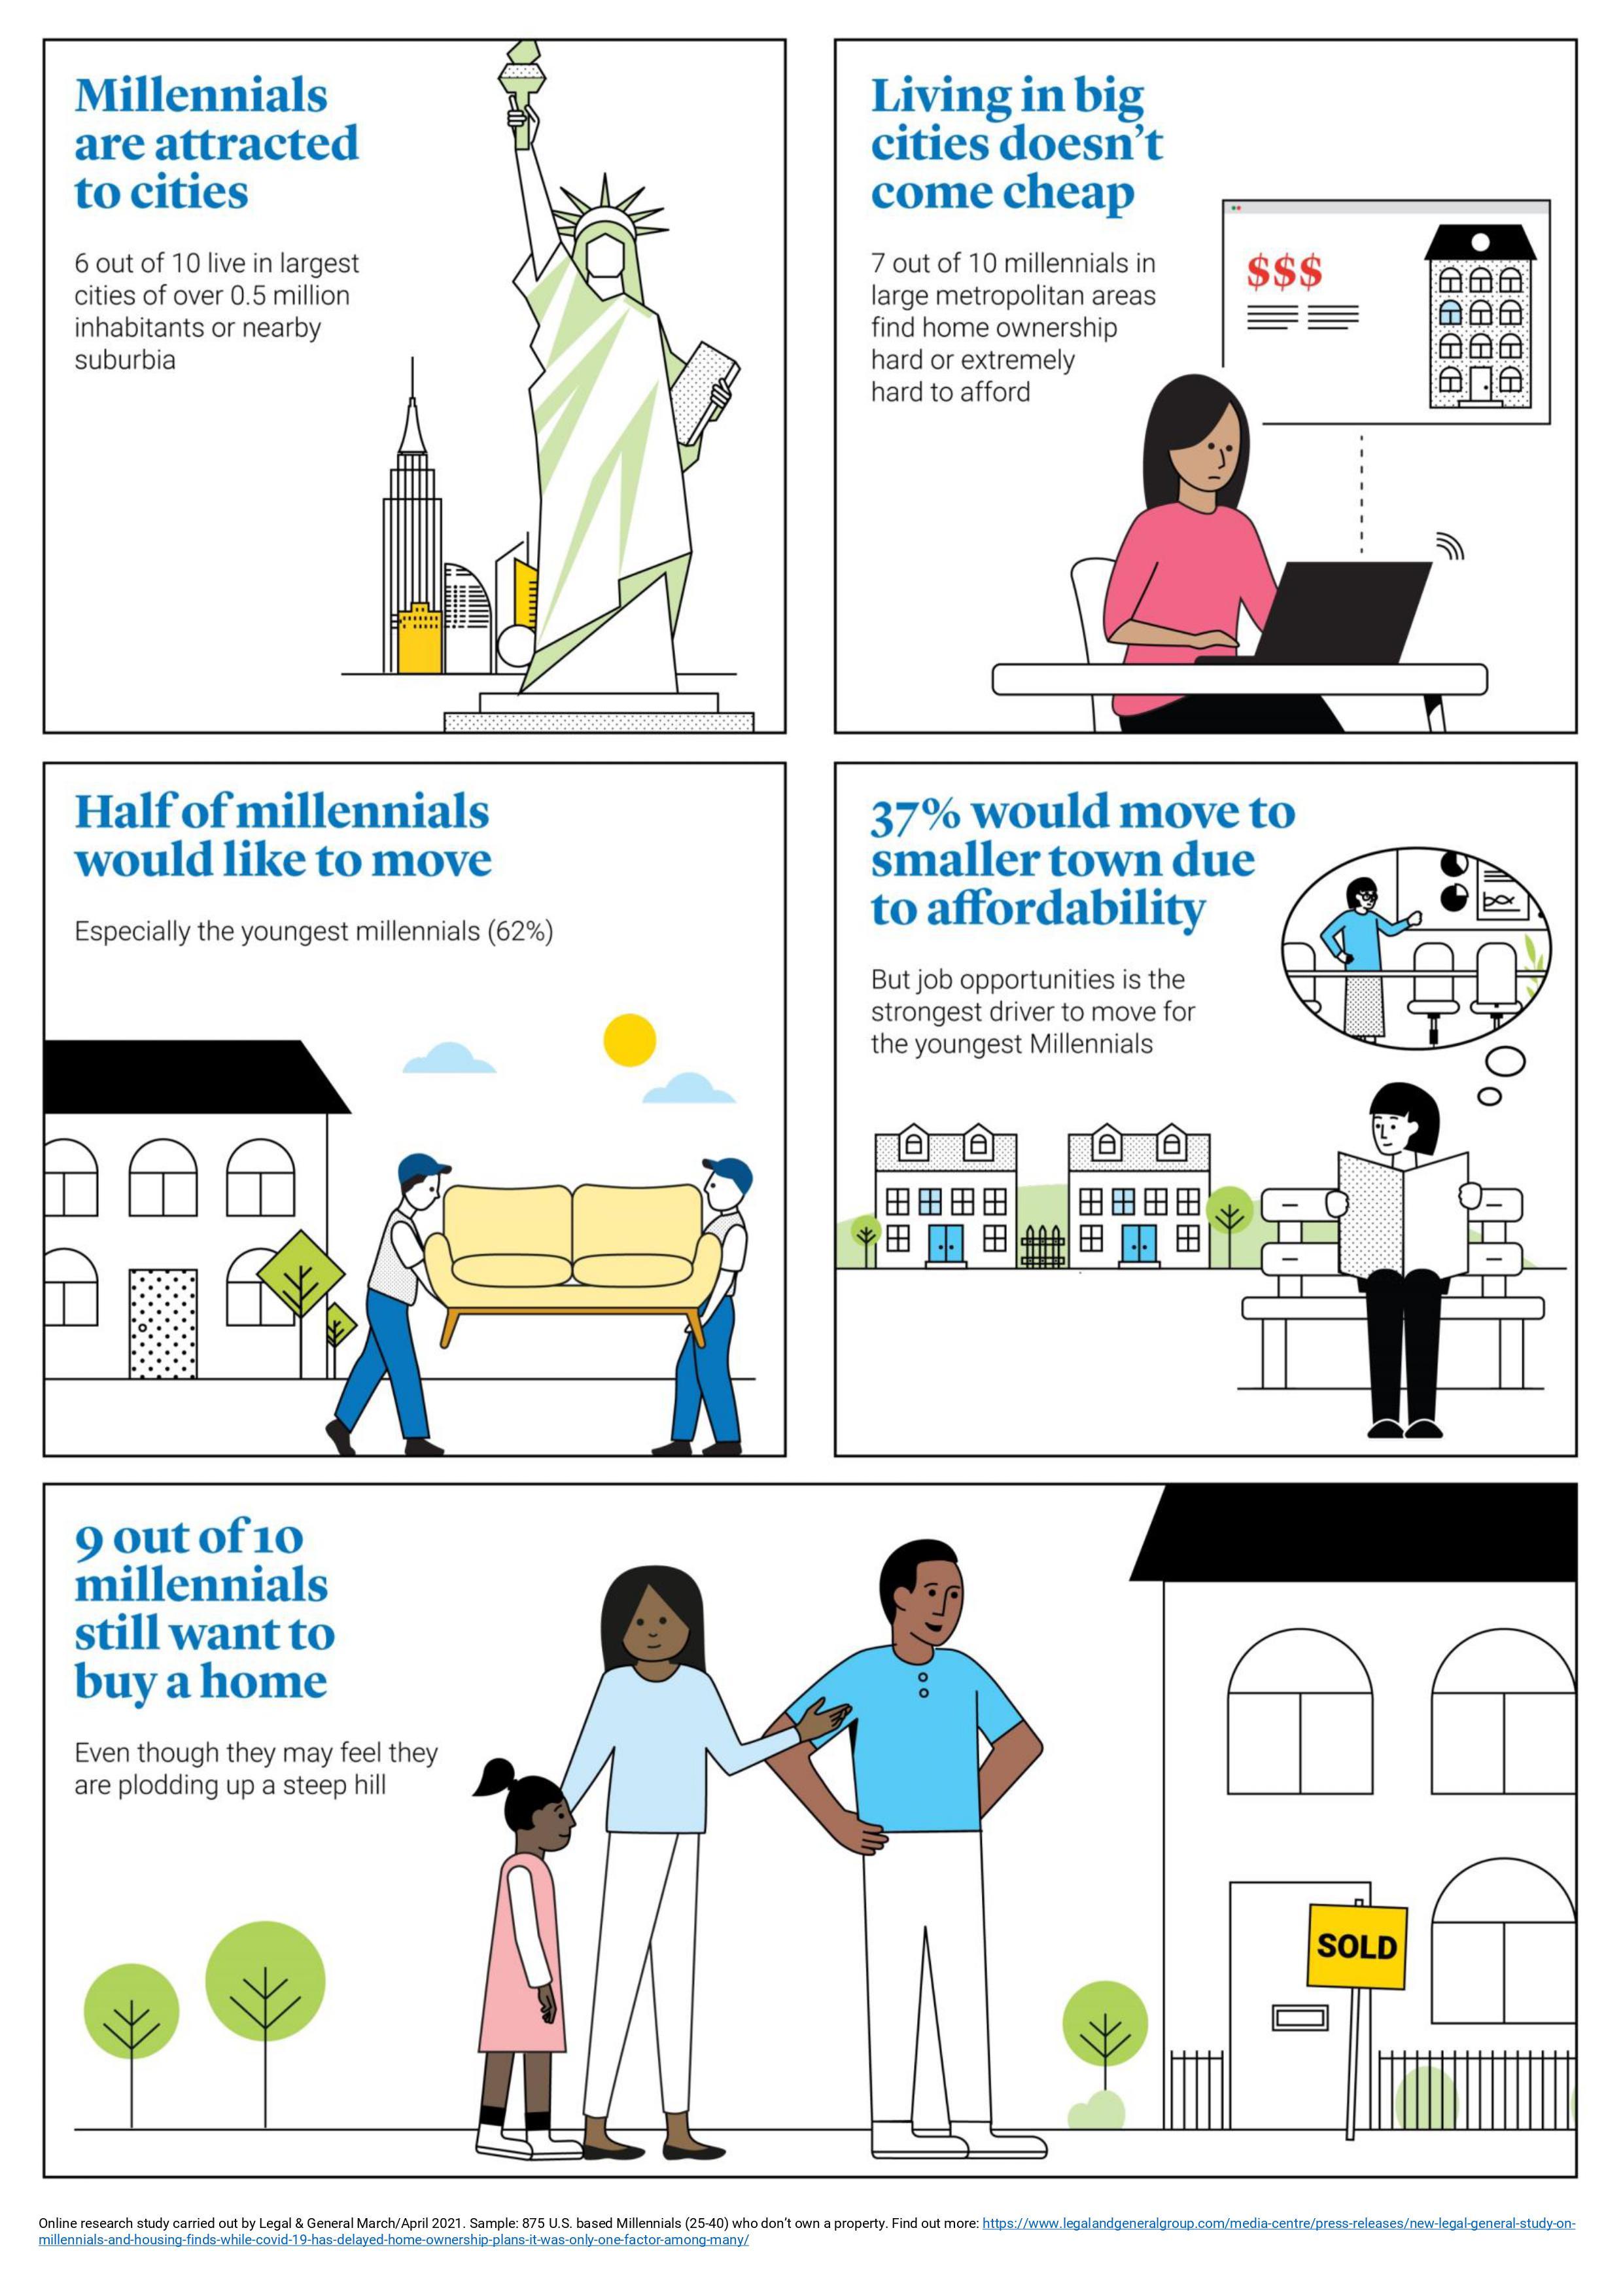 Legal & General U.S. Millennials Housing Report, July 2021